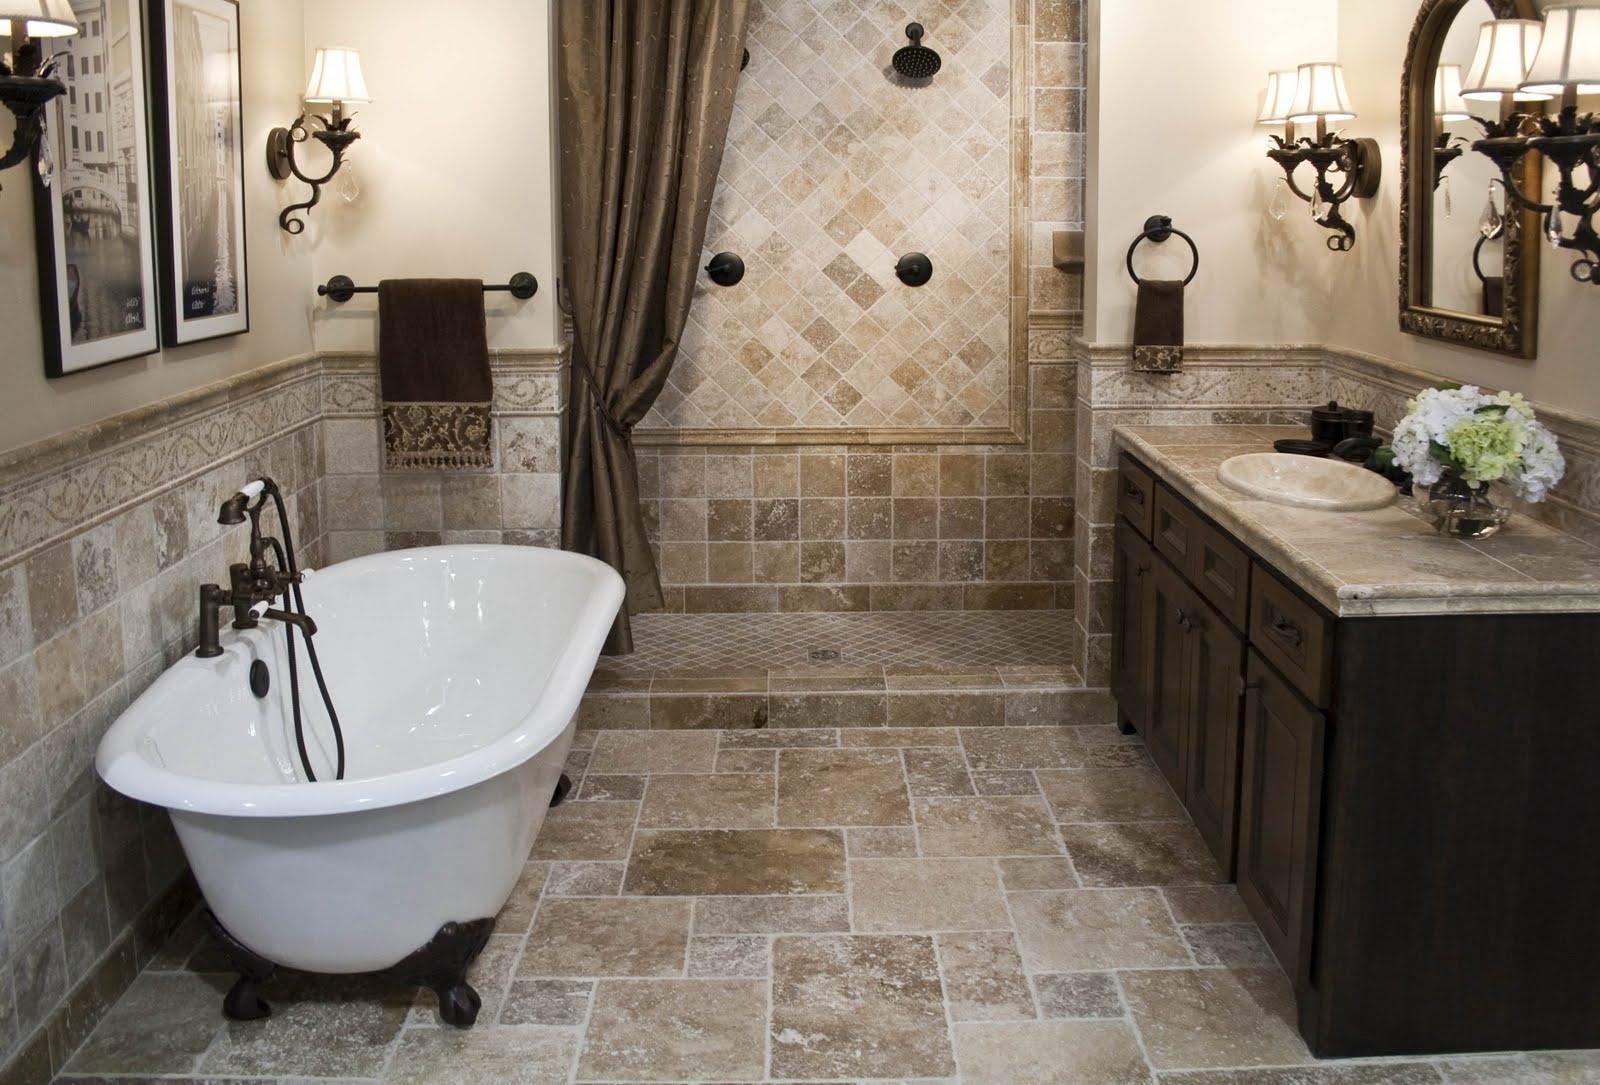 Bathroom Remodels | Katy Construction & Remodeling Regarding Bathroom Remodel (Image 15 of 33)